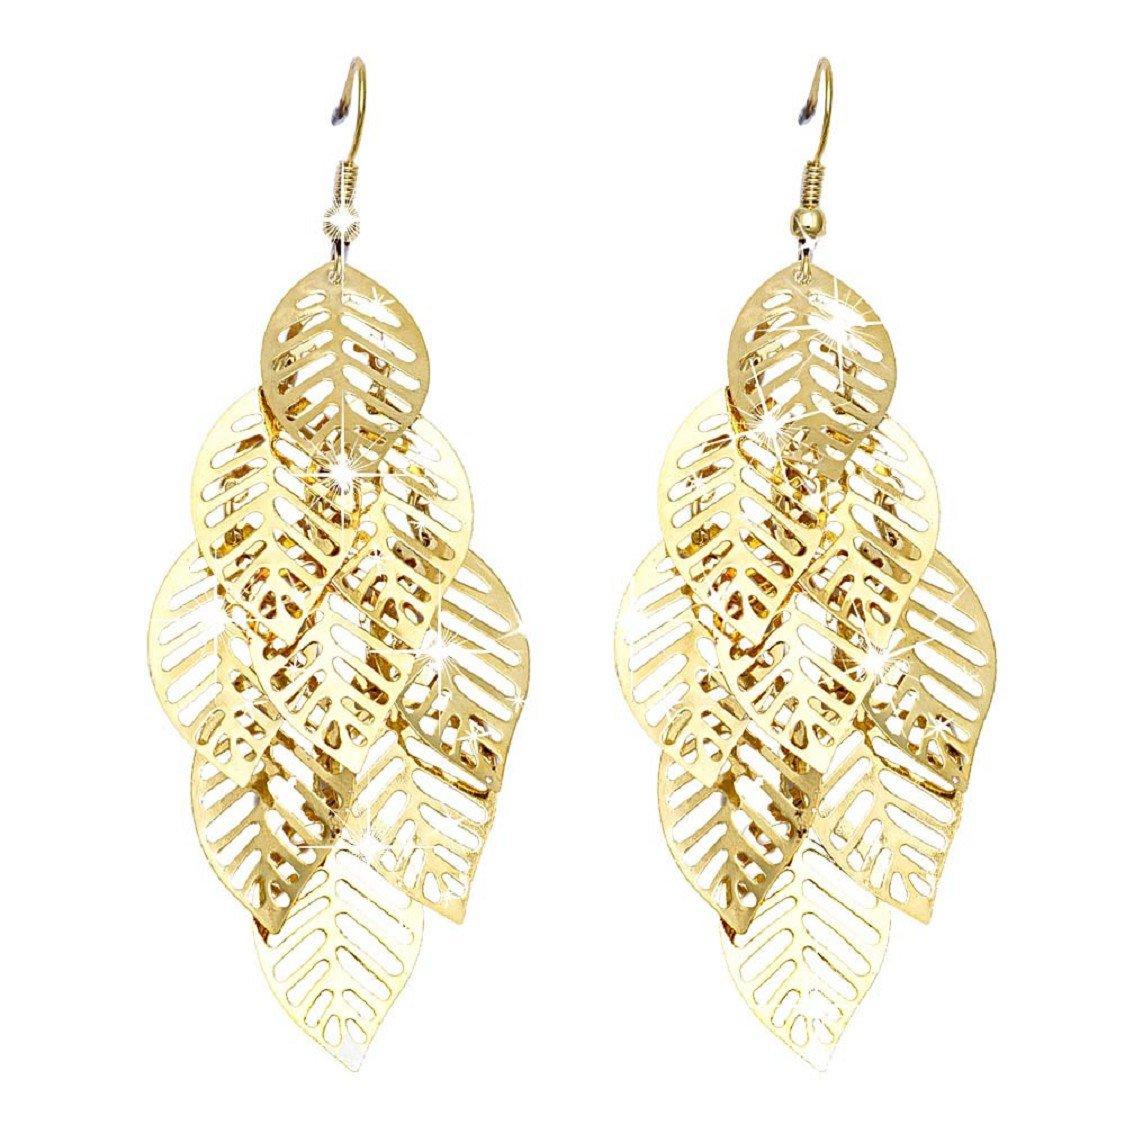 Ikevan 2017 New Women Bohemian Style Bracelet Retro Tassel Multilayer Leaves Earrings Gold